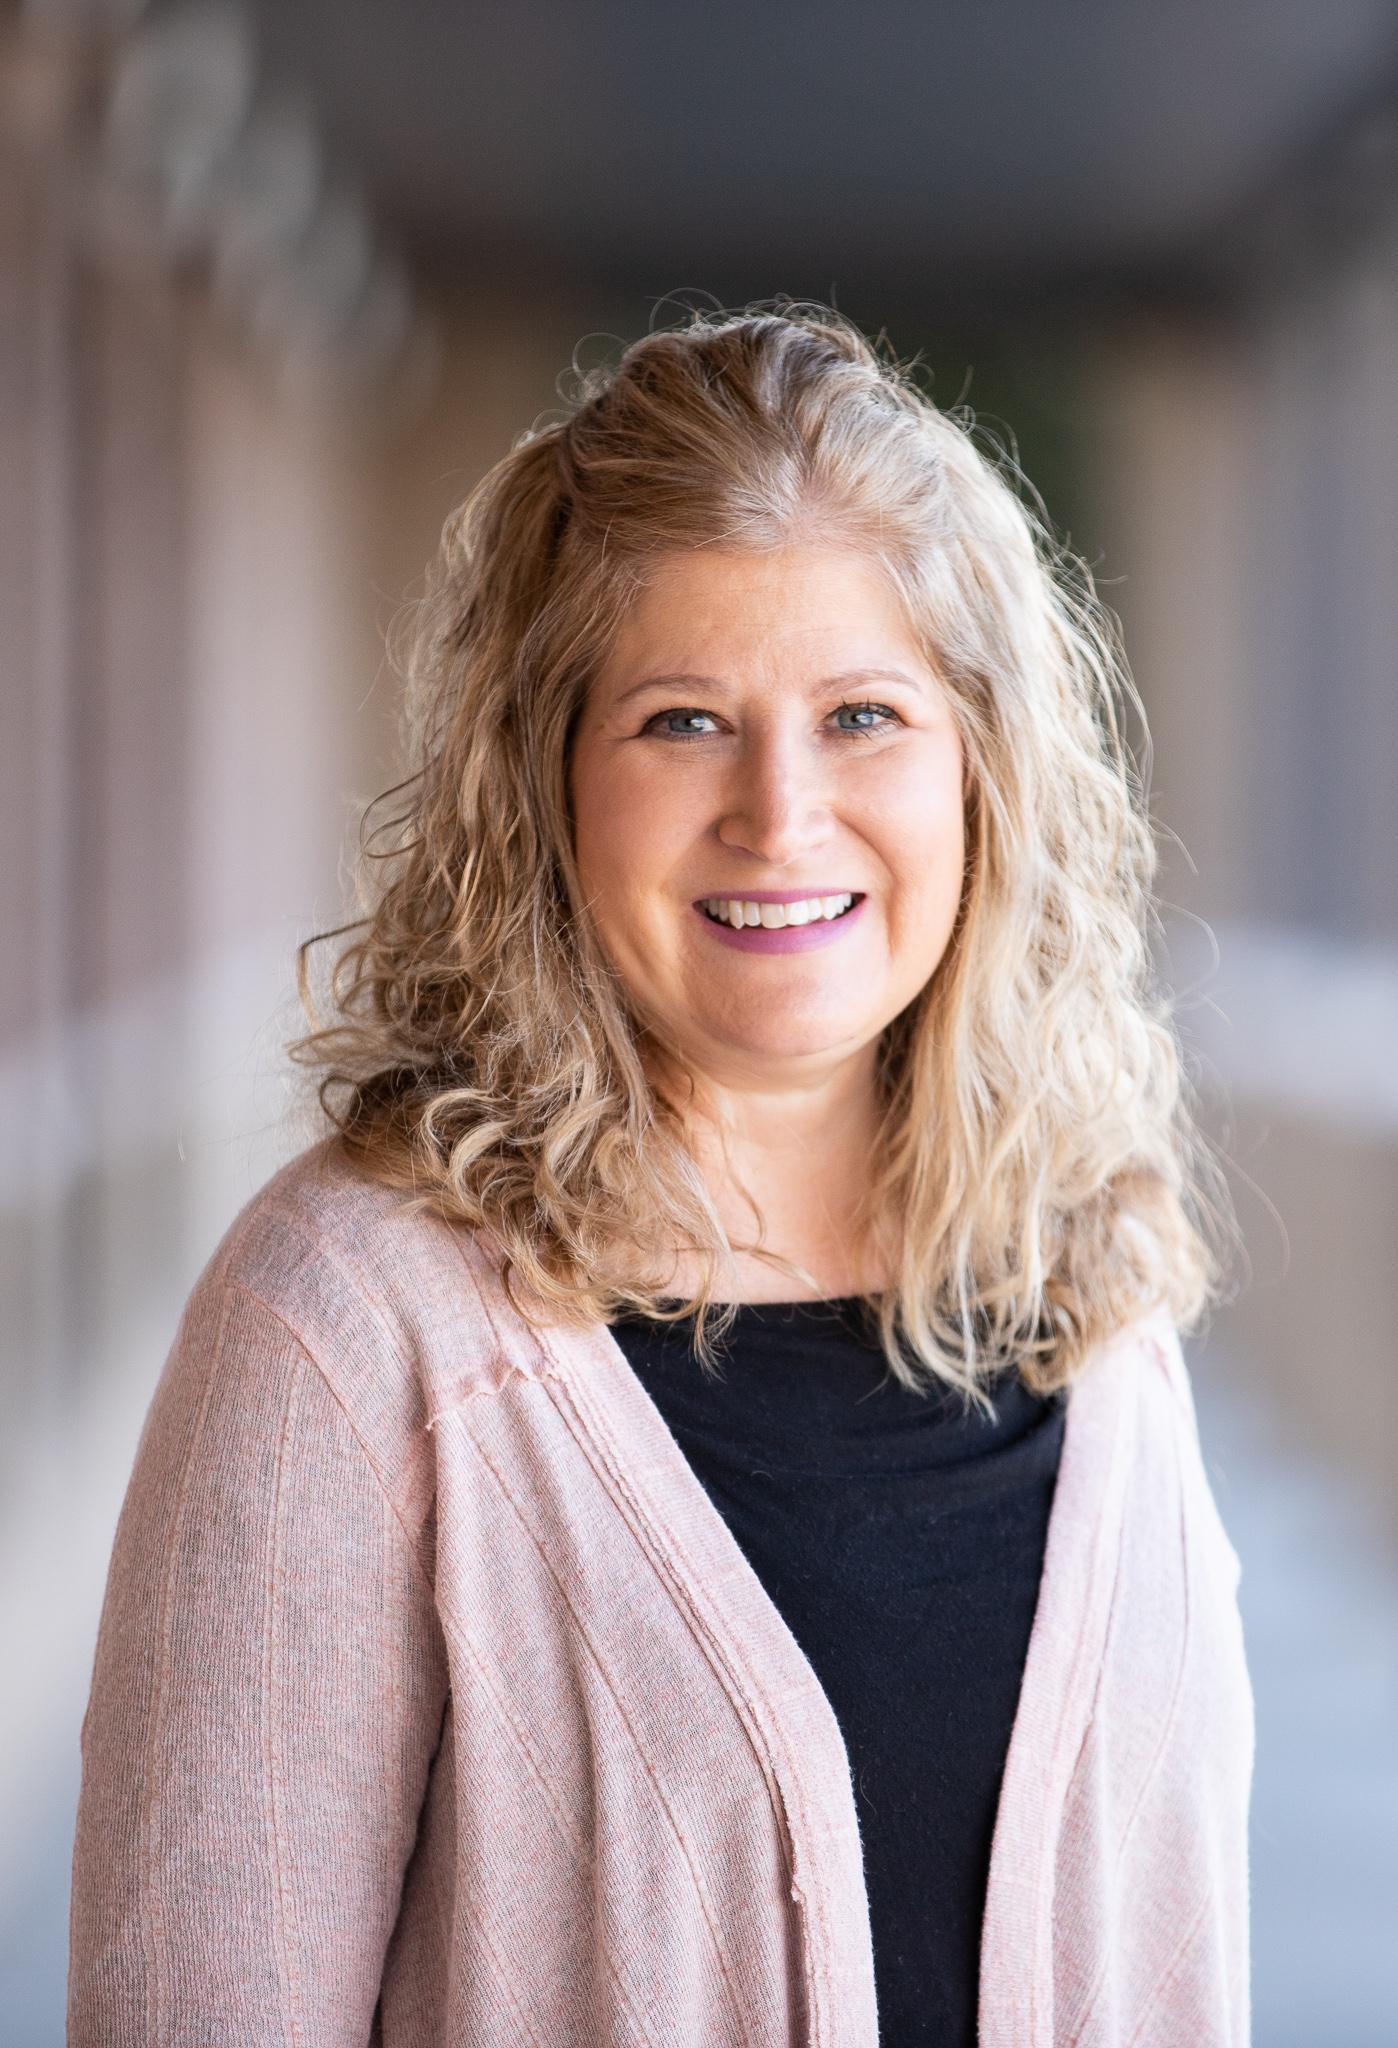 Kathy Posey